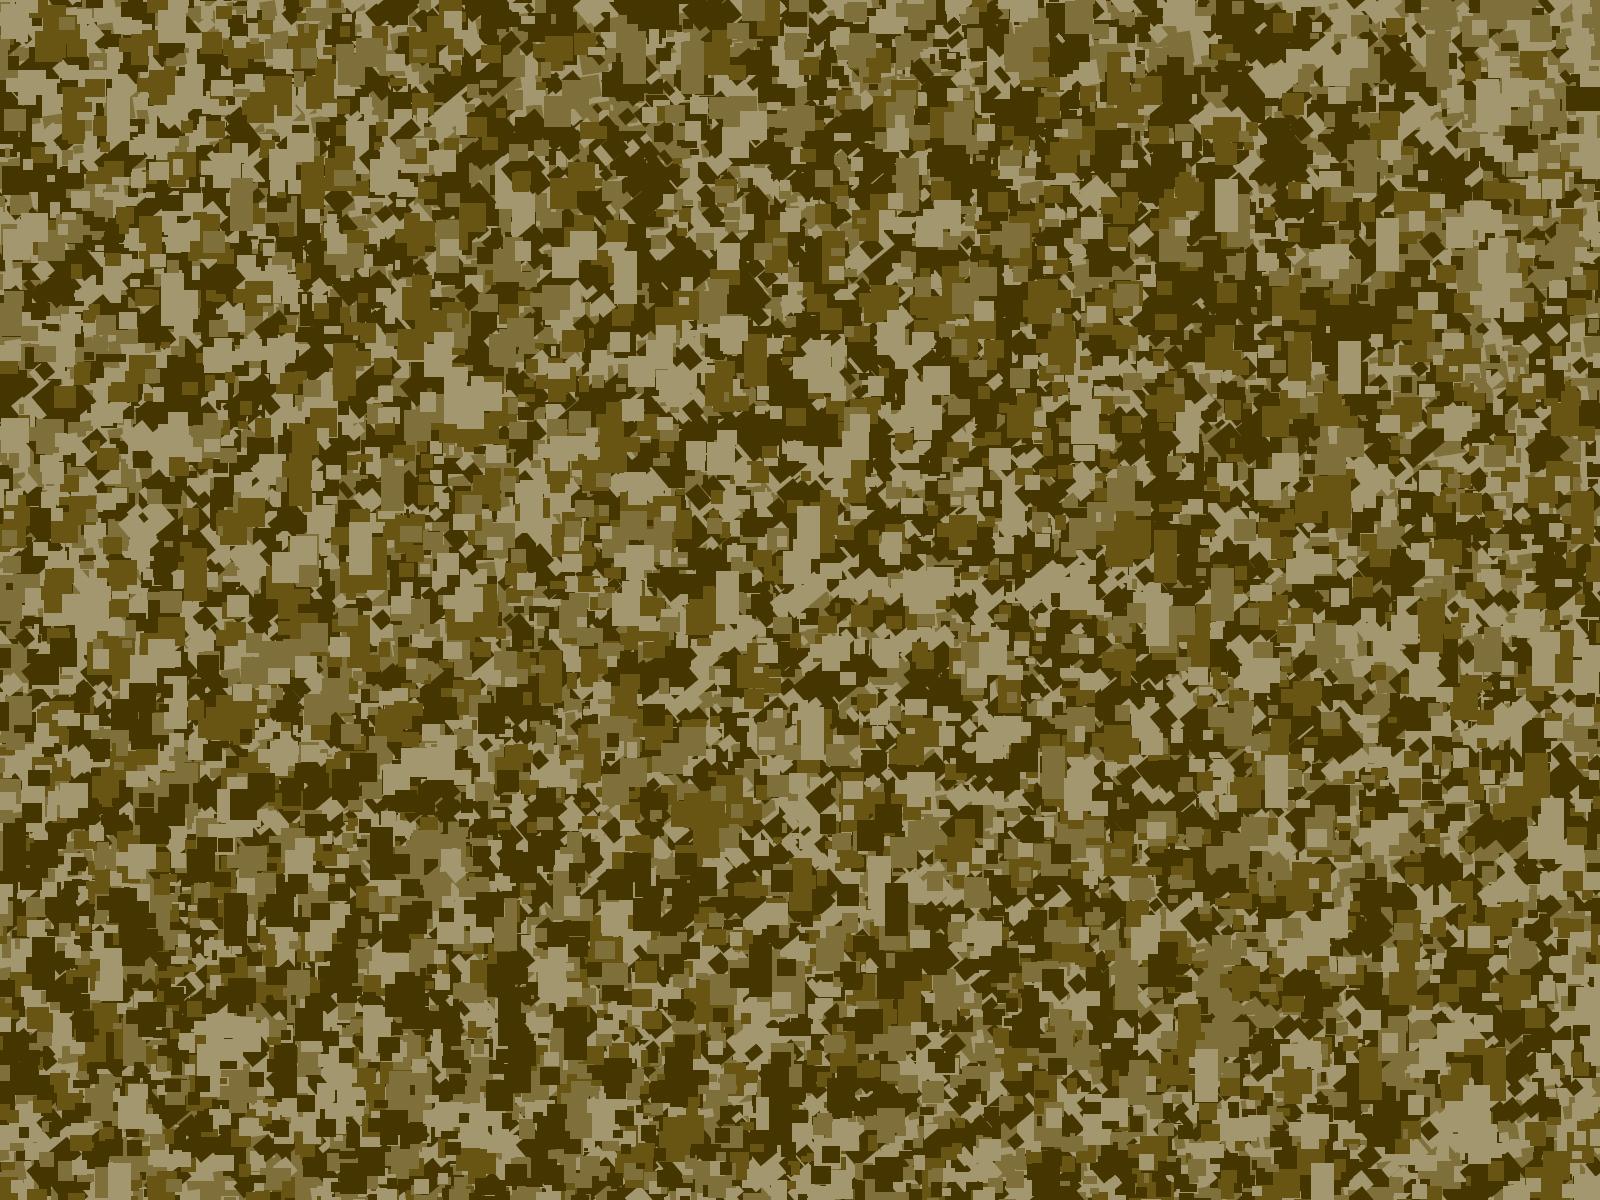 camouflage wallpaper 2015   Grasscloth Wallpaper 1600x1200